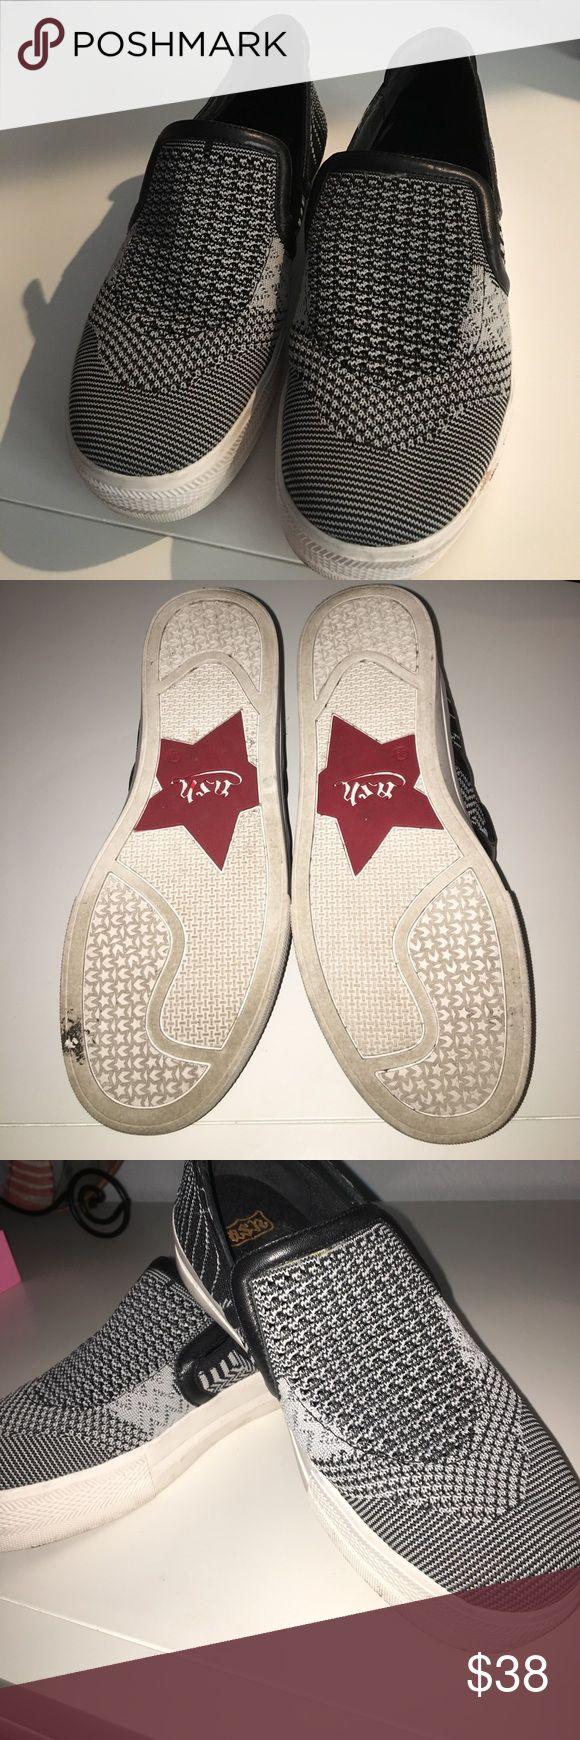 ASH SNEAKERS ASH worn twice sneakers/espadrilles!!! Ash Shoes Espadrilles